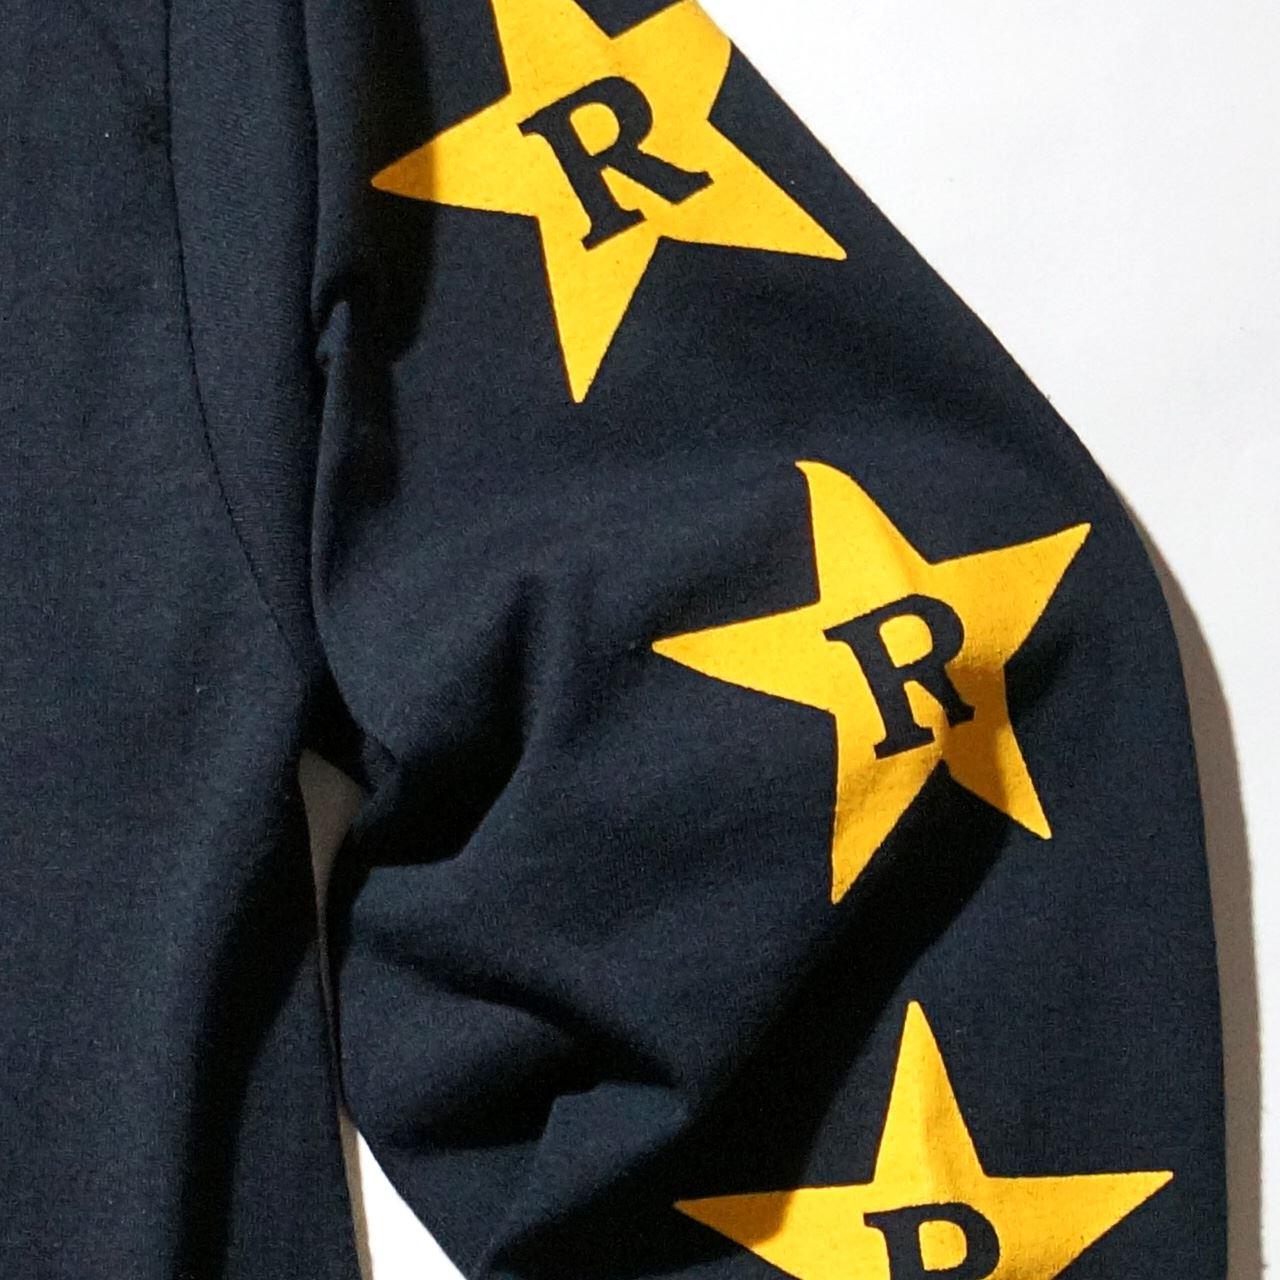 DRAIN ロングスリーブTシャツ Rev Logo-Black